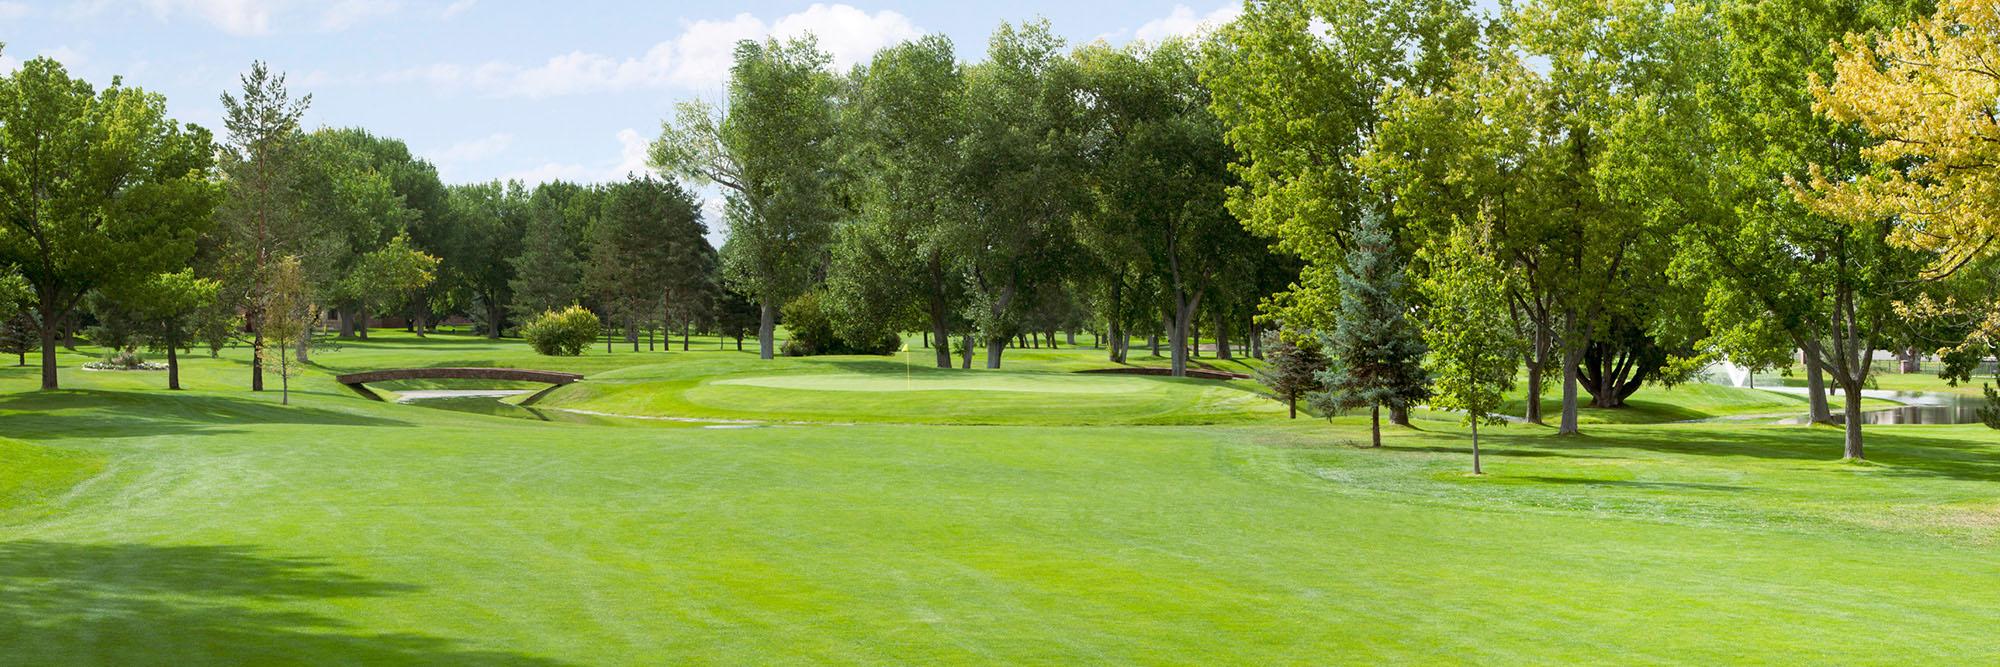 Golf Course Image - Columbine Country Club No. 5